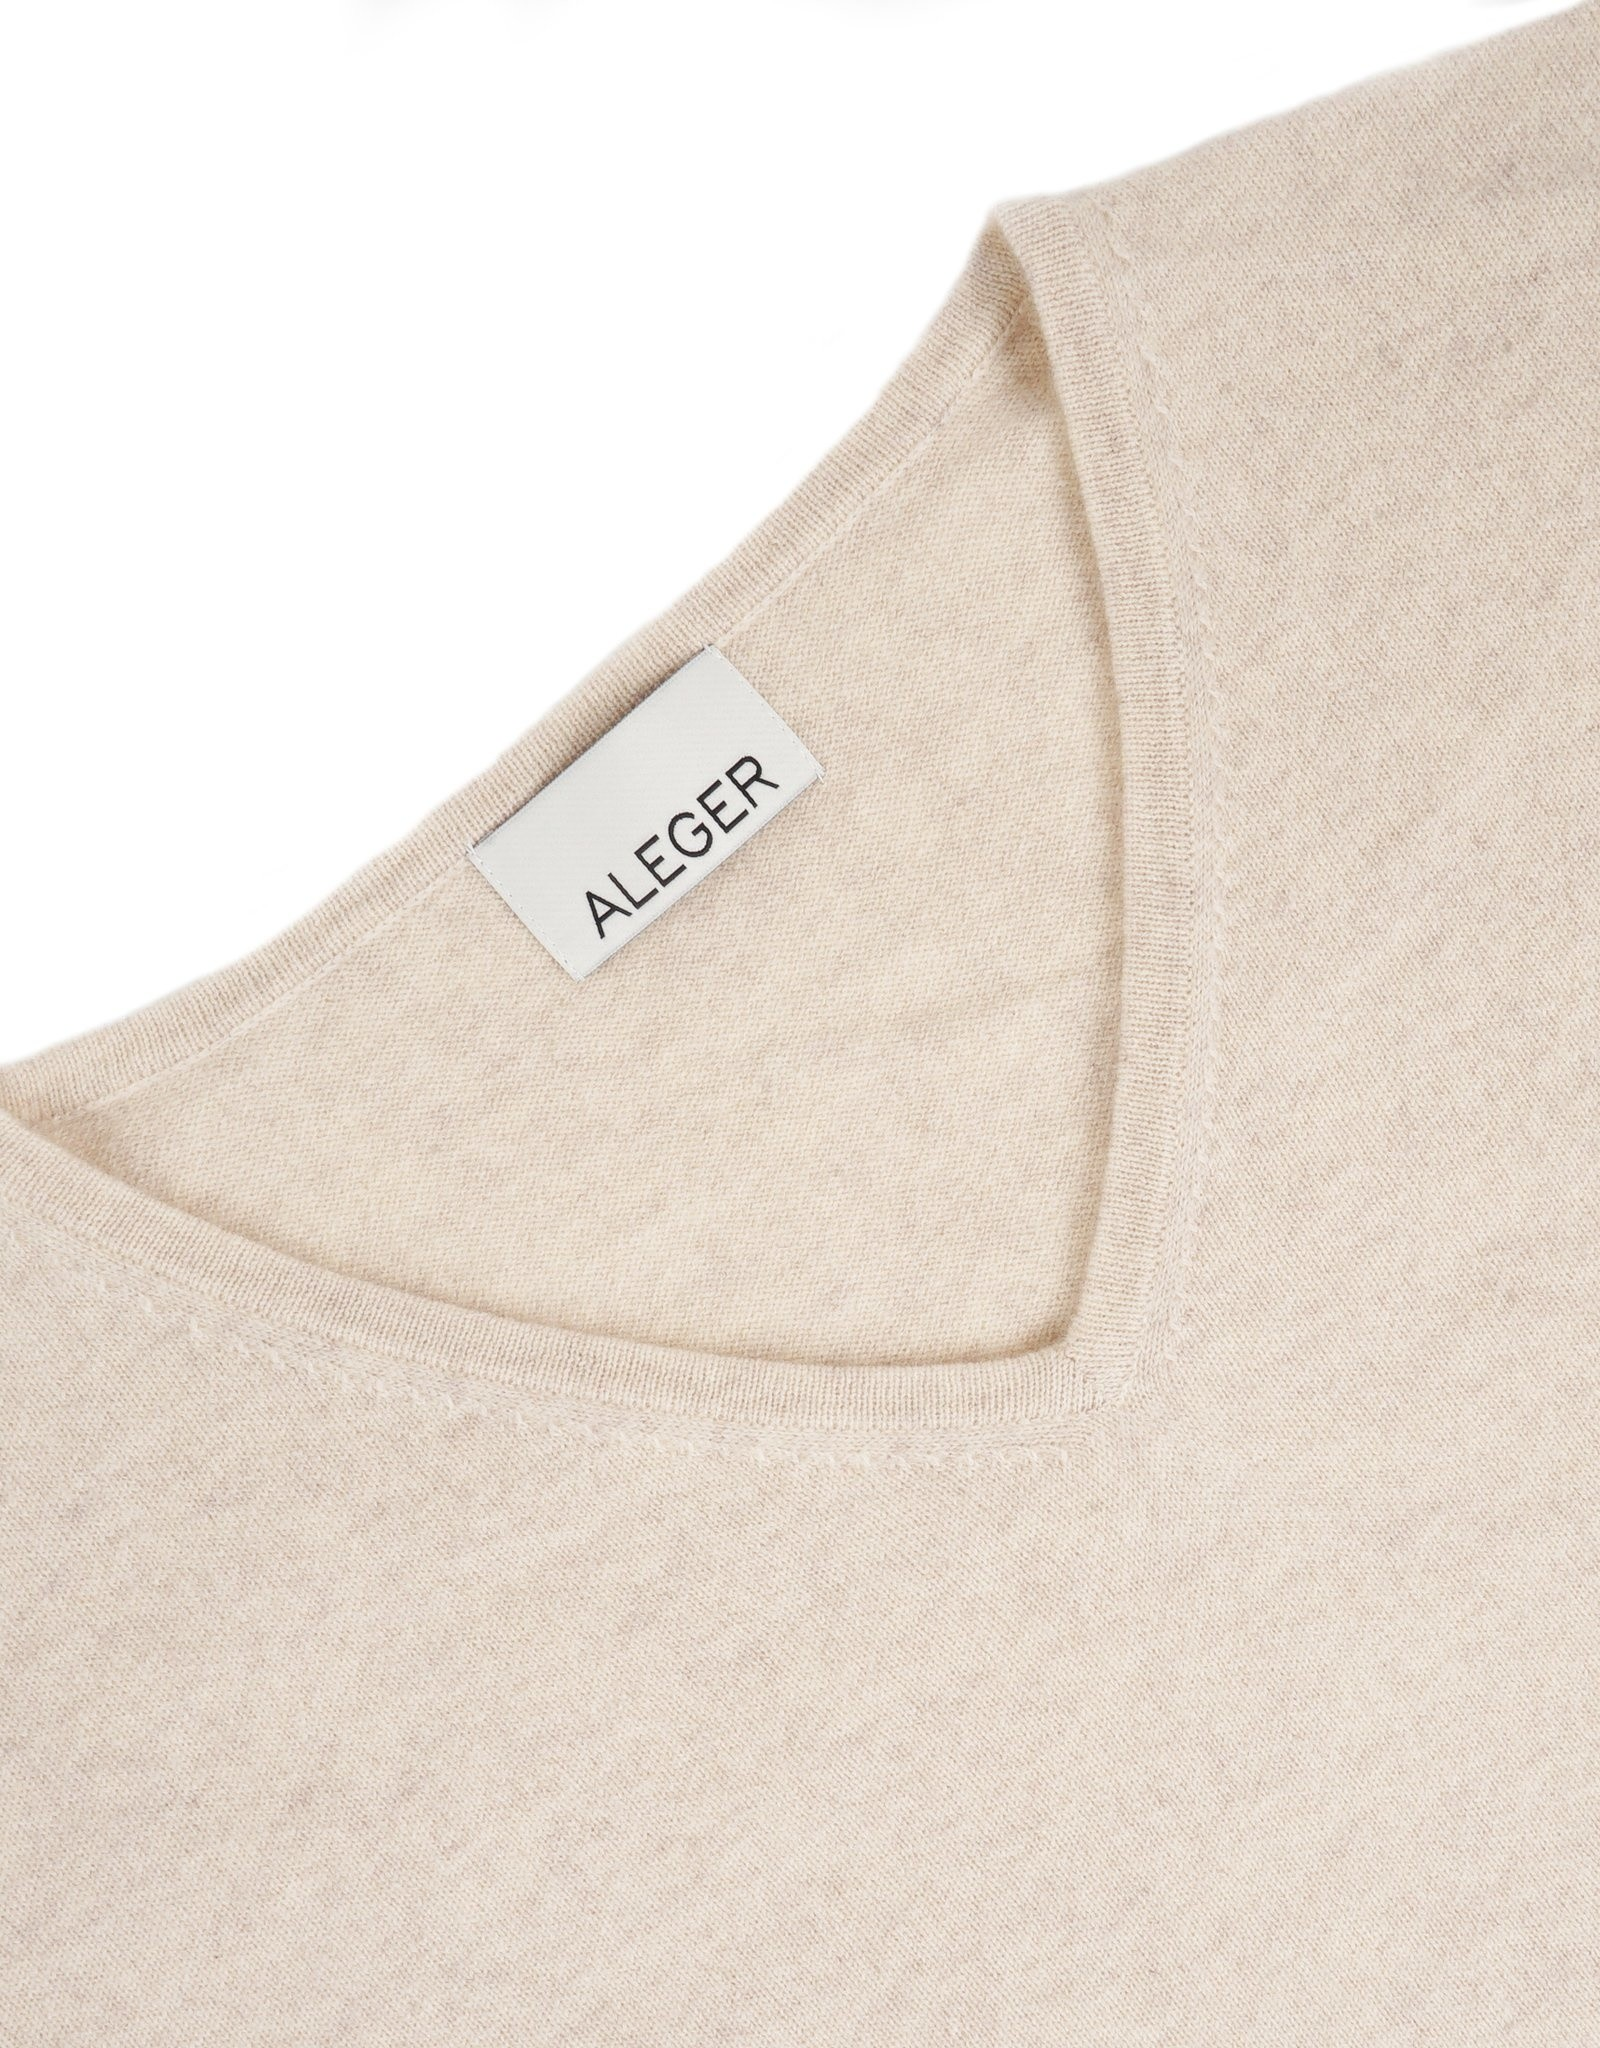 ALEGER CASHMERE BLEND V NECK OVERSIZE SWEATER SHELL